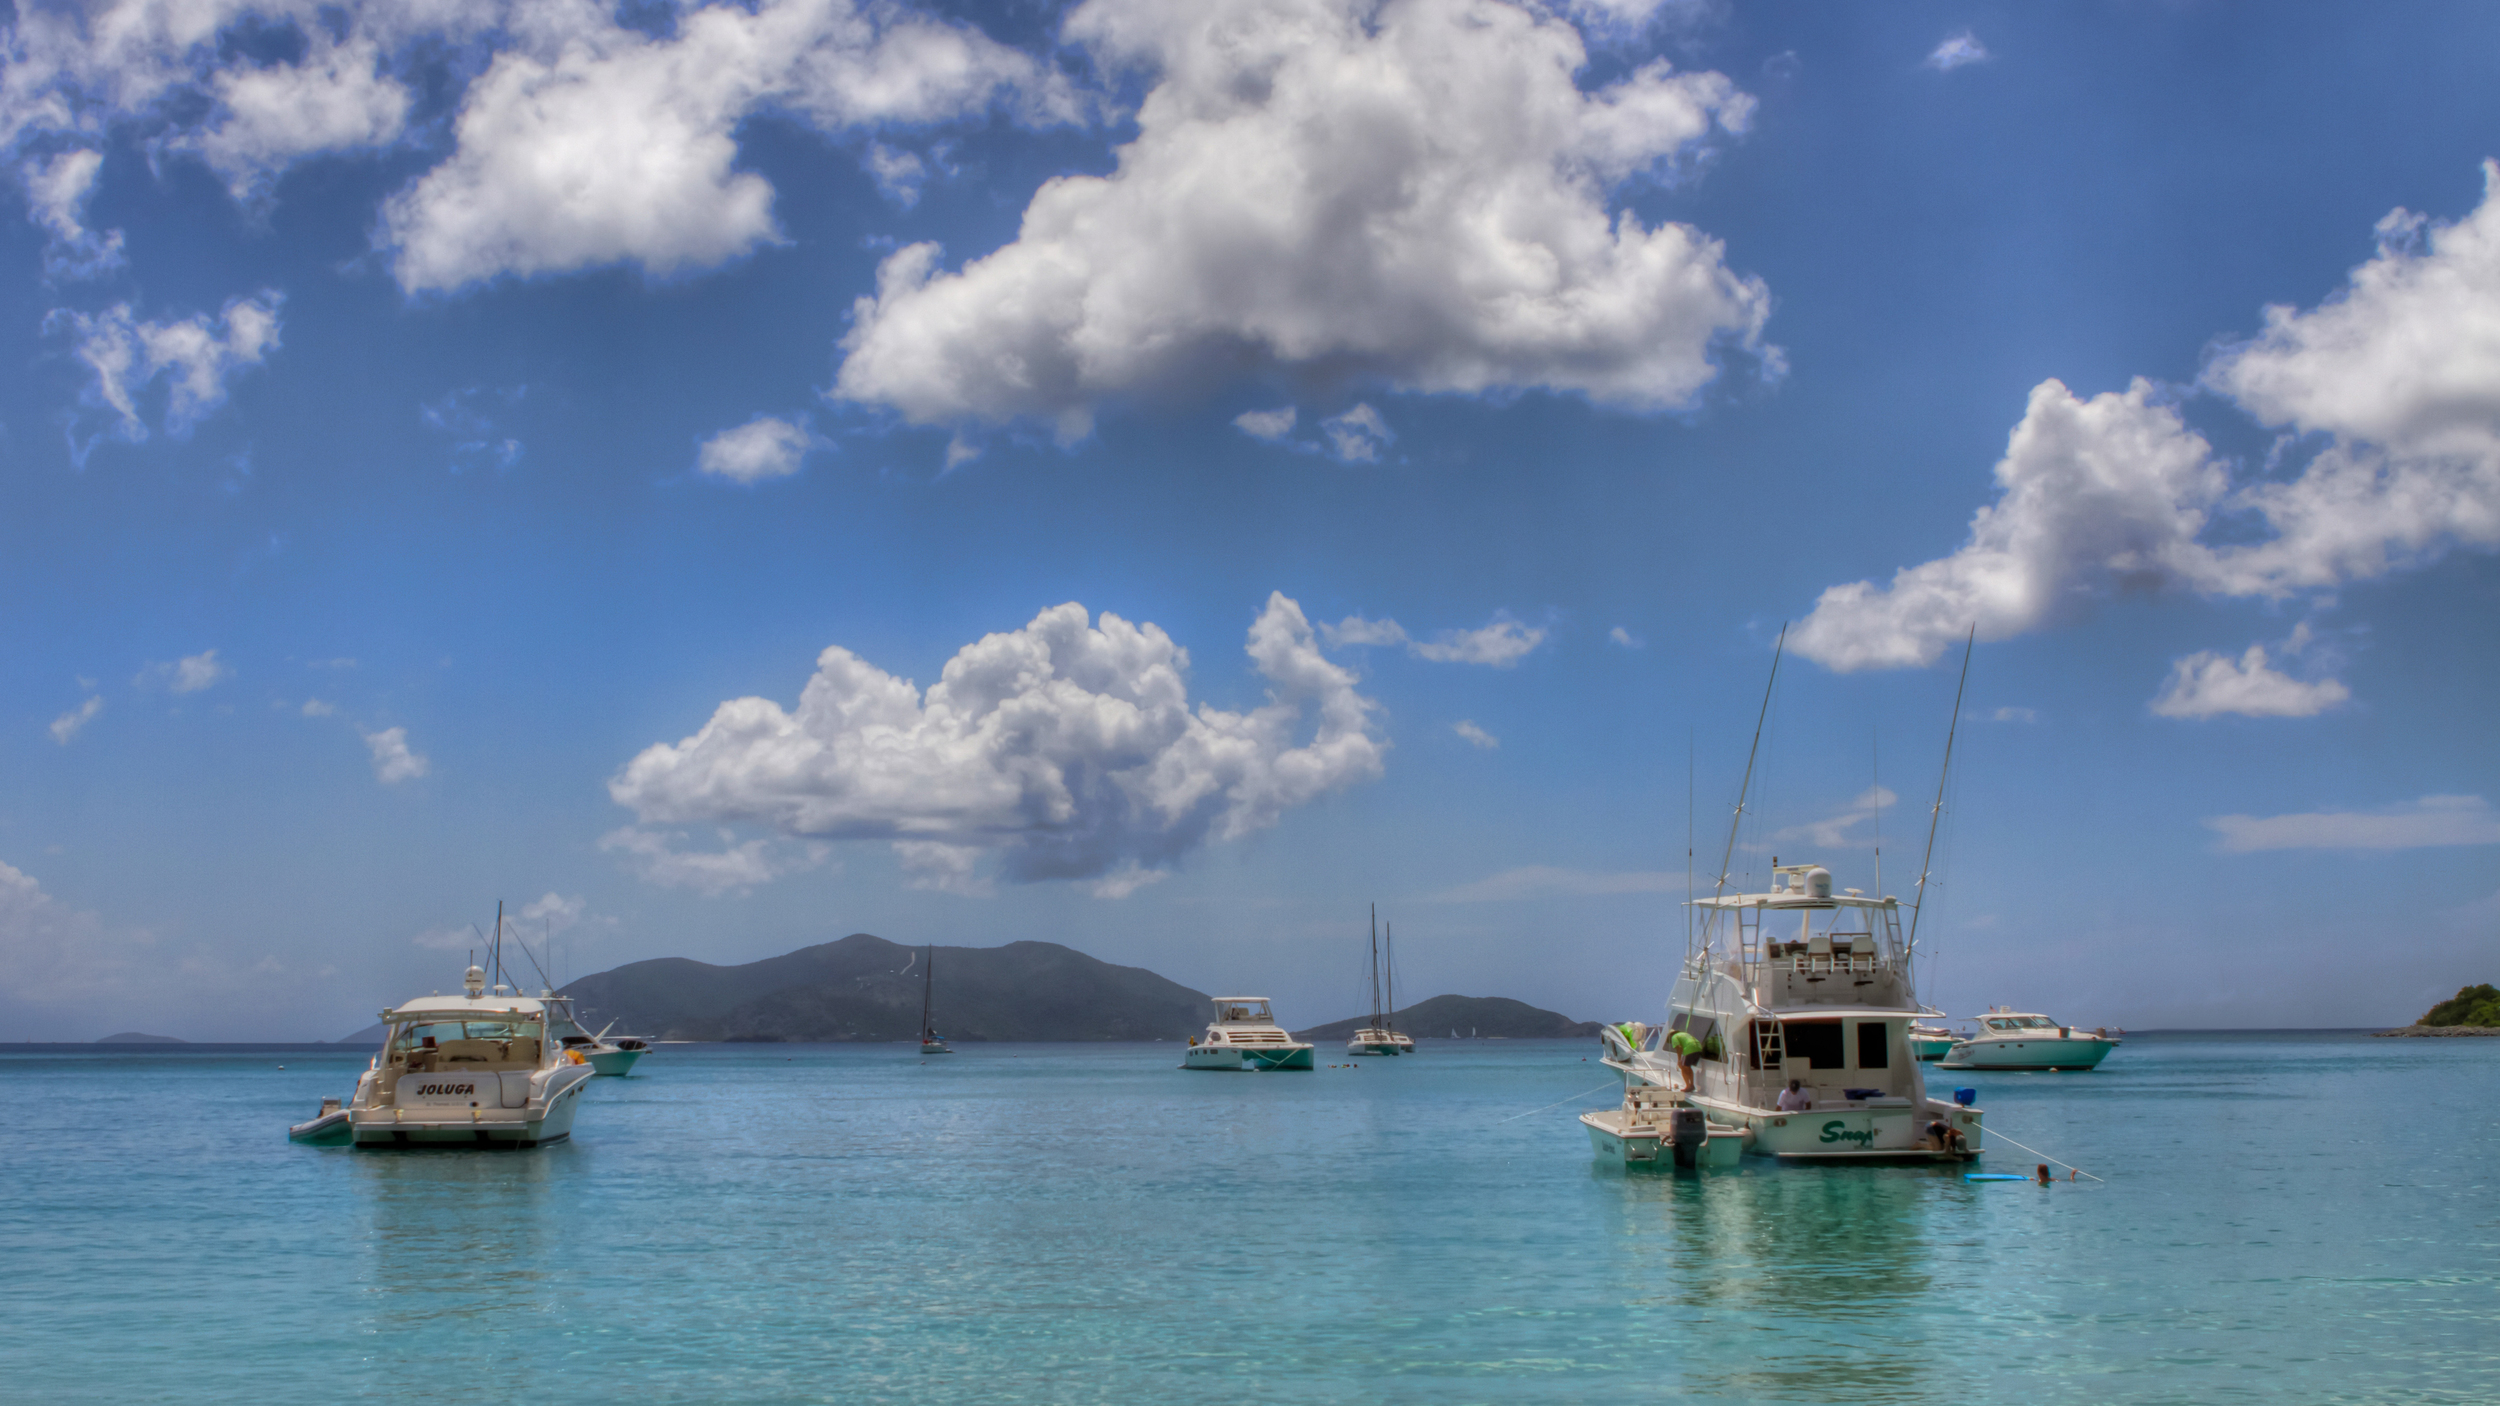 Click Photo to Enlarge |Tortola, British Virgin Islands |© Carl Nethercutt